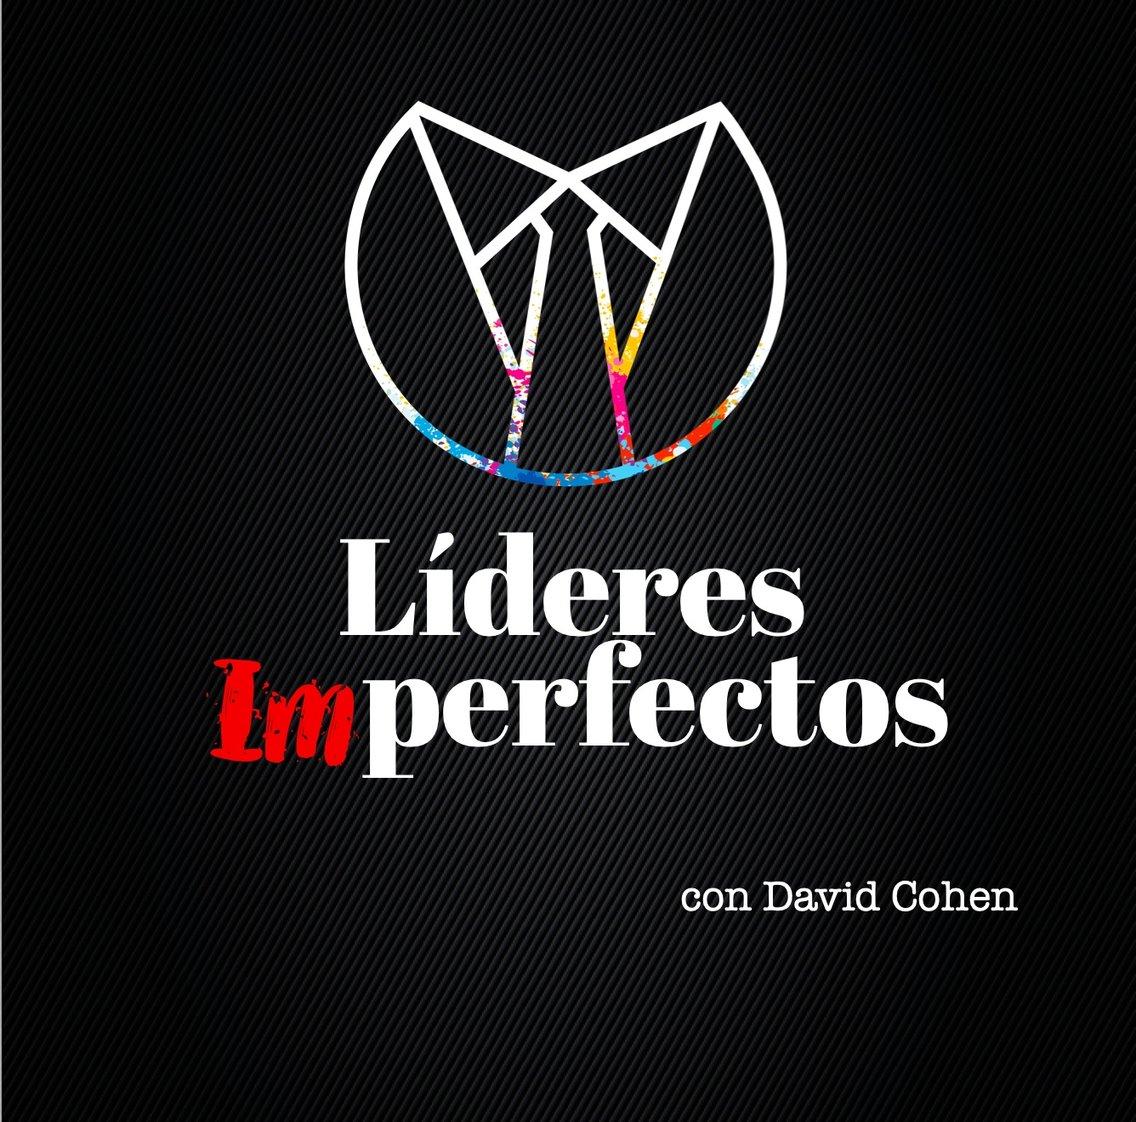 Líderes Imperfectos - Cover Image